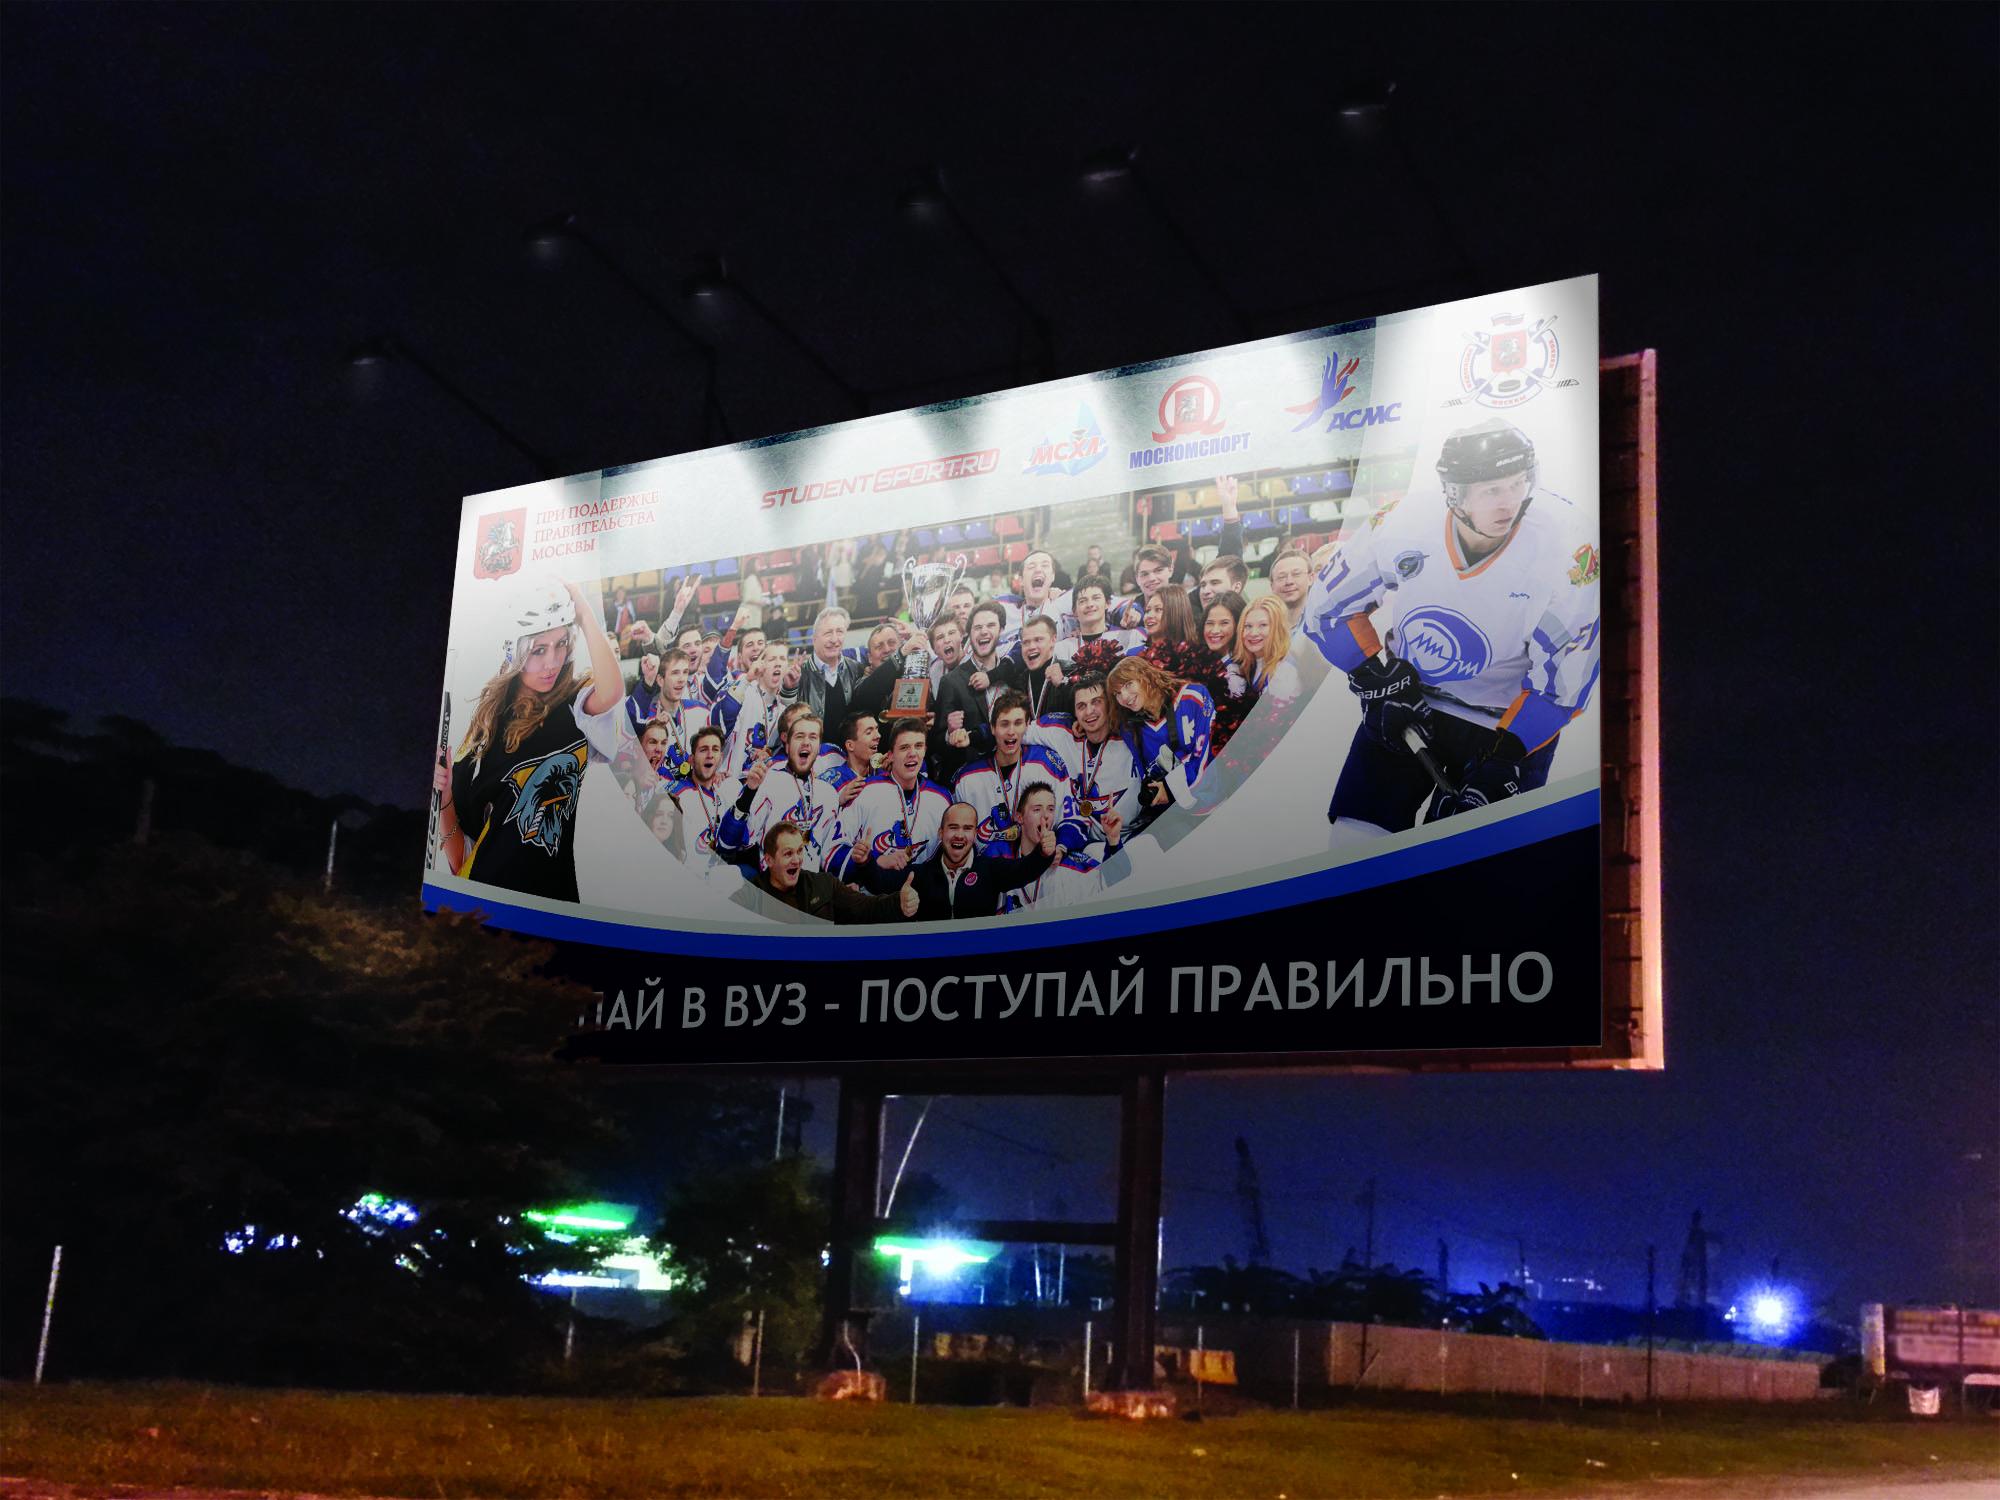 МСХЛ баннер